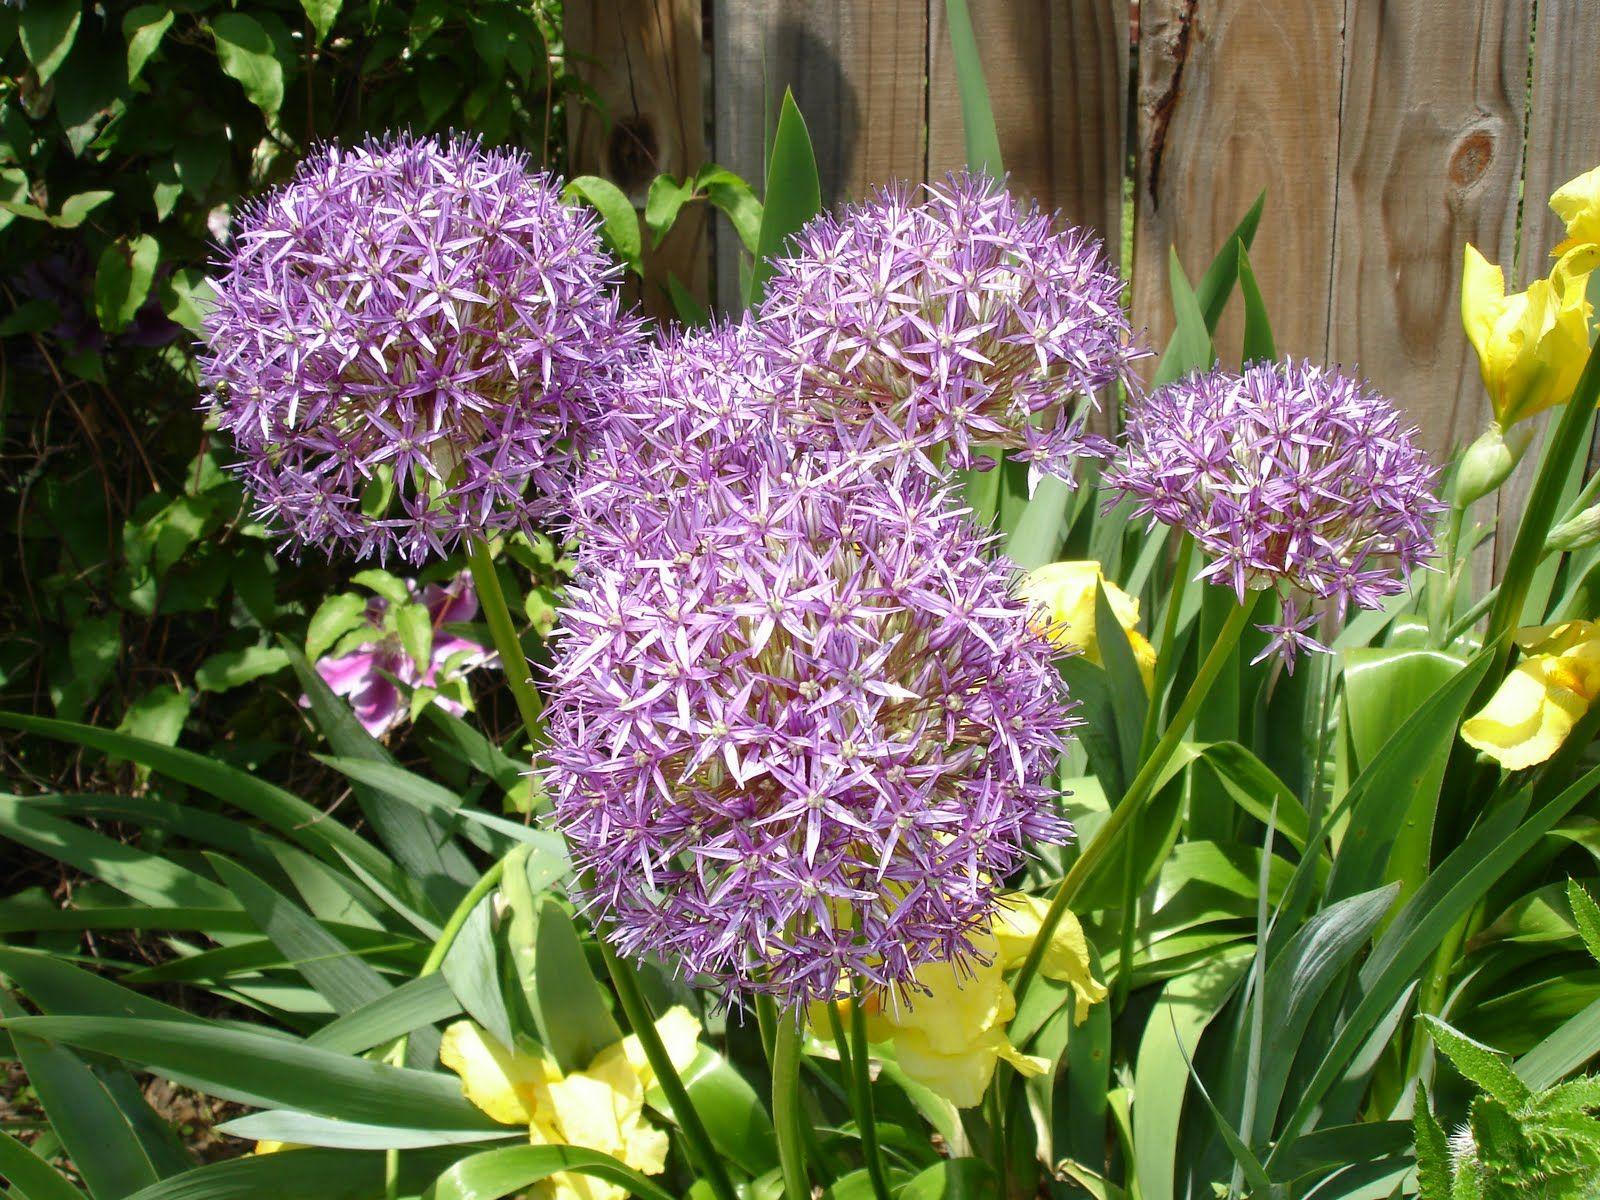 Names of Flowers Cashjocky's Photos Puffy Purple